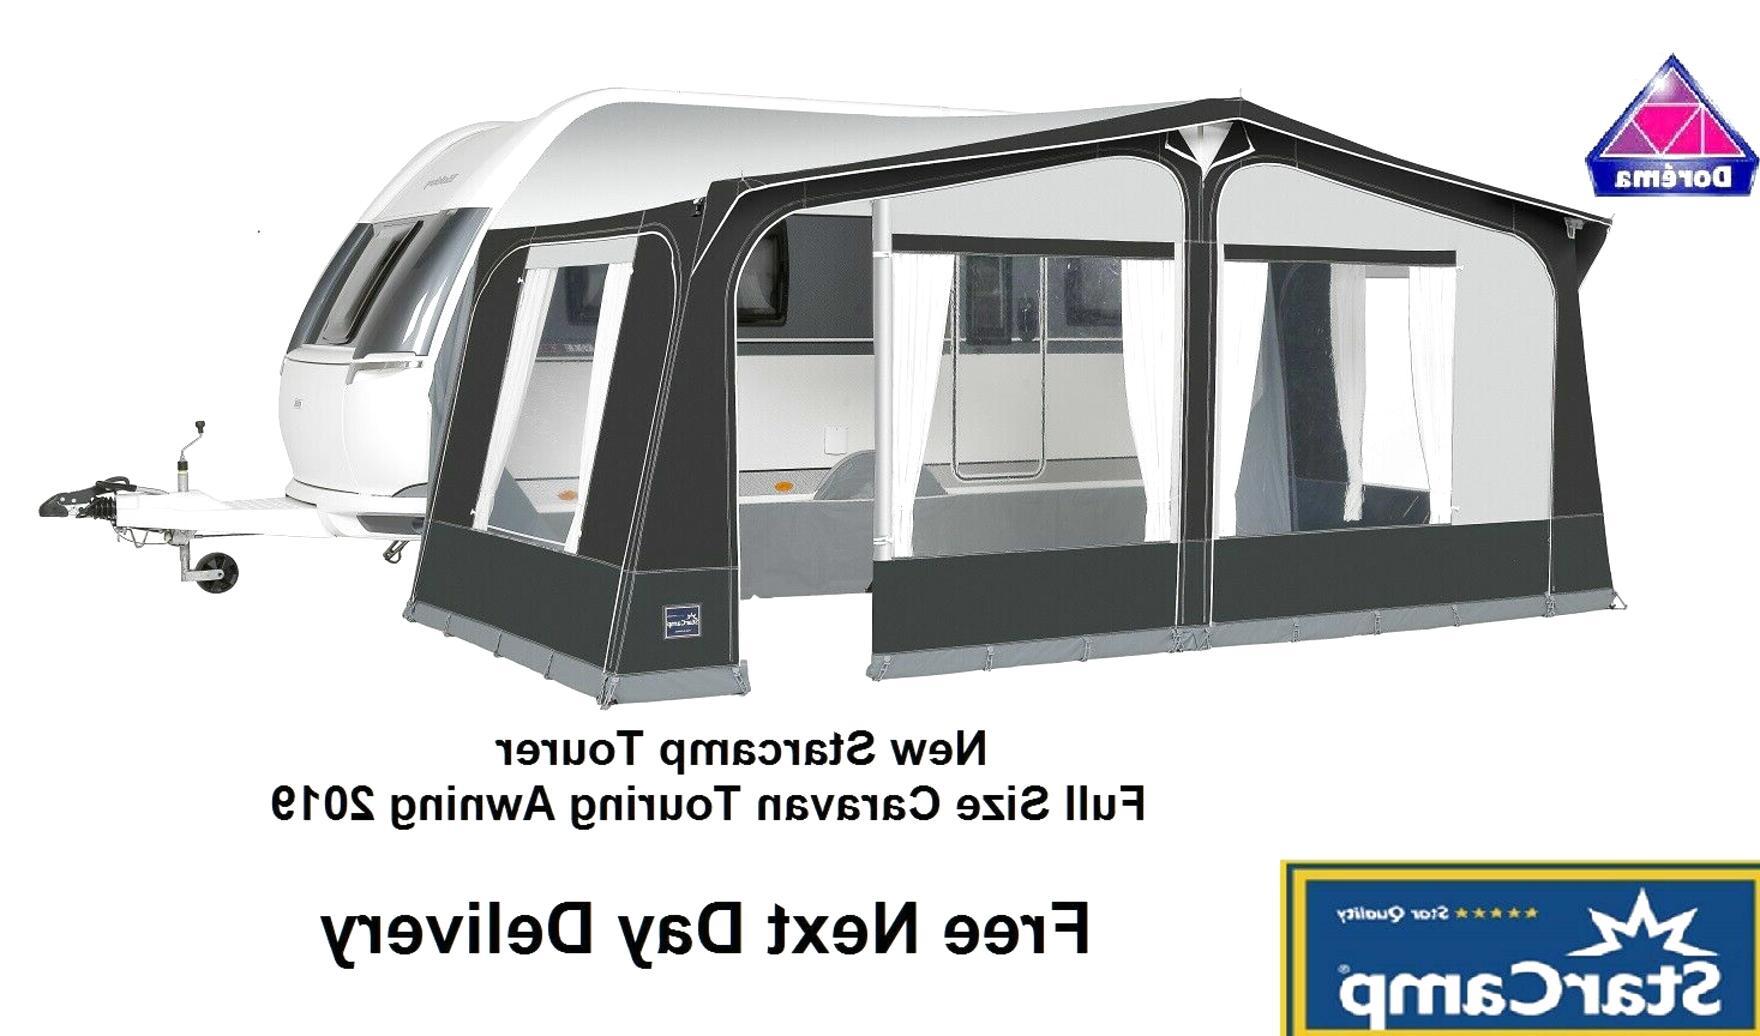 caravan awning 1100 cm for sale